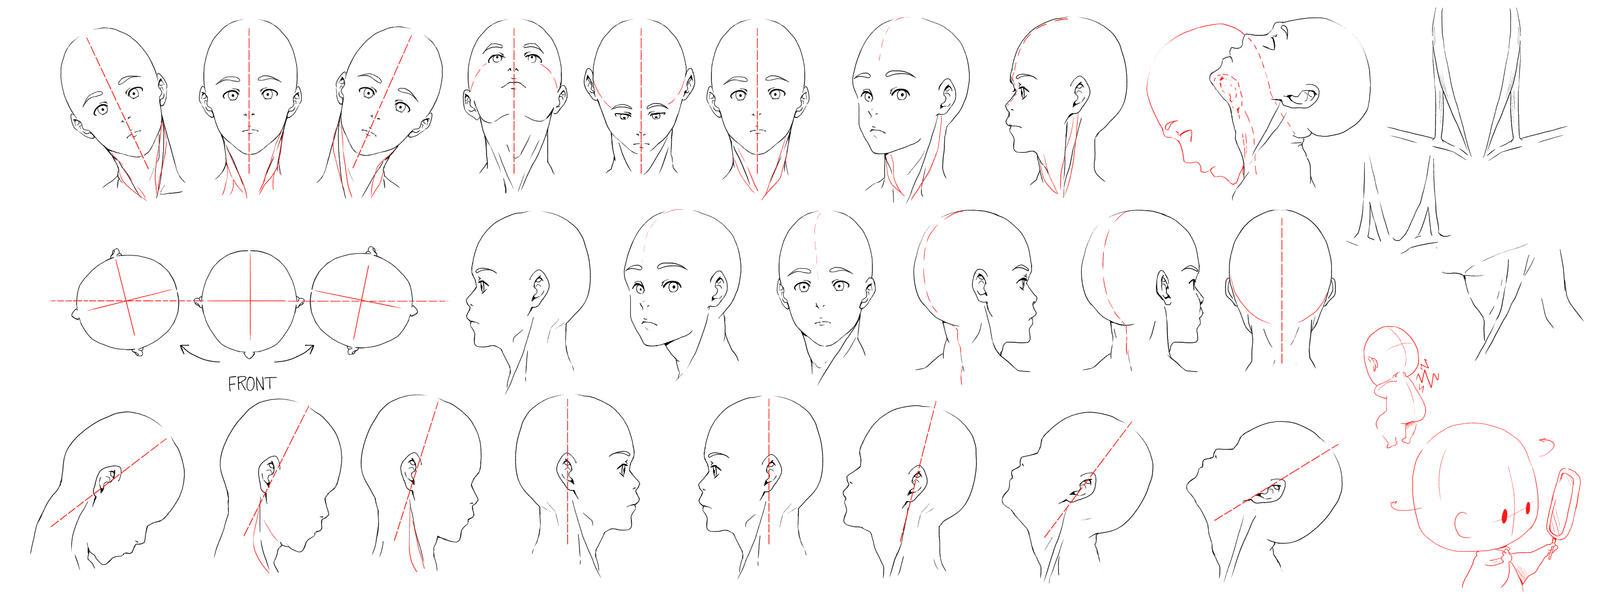 Resources: Head-Neck 1